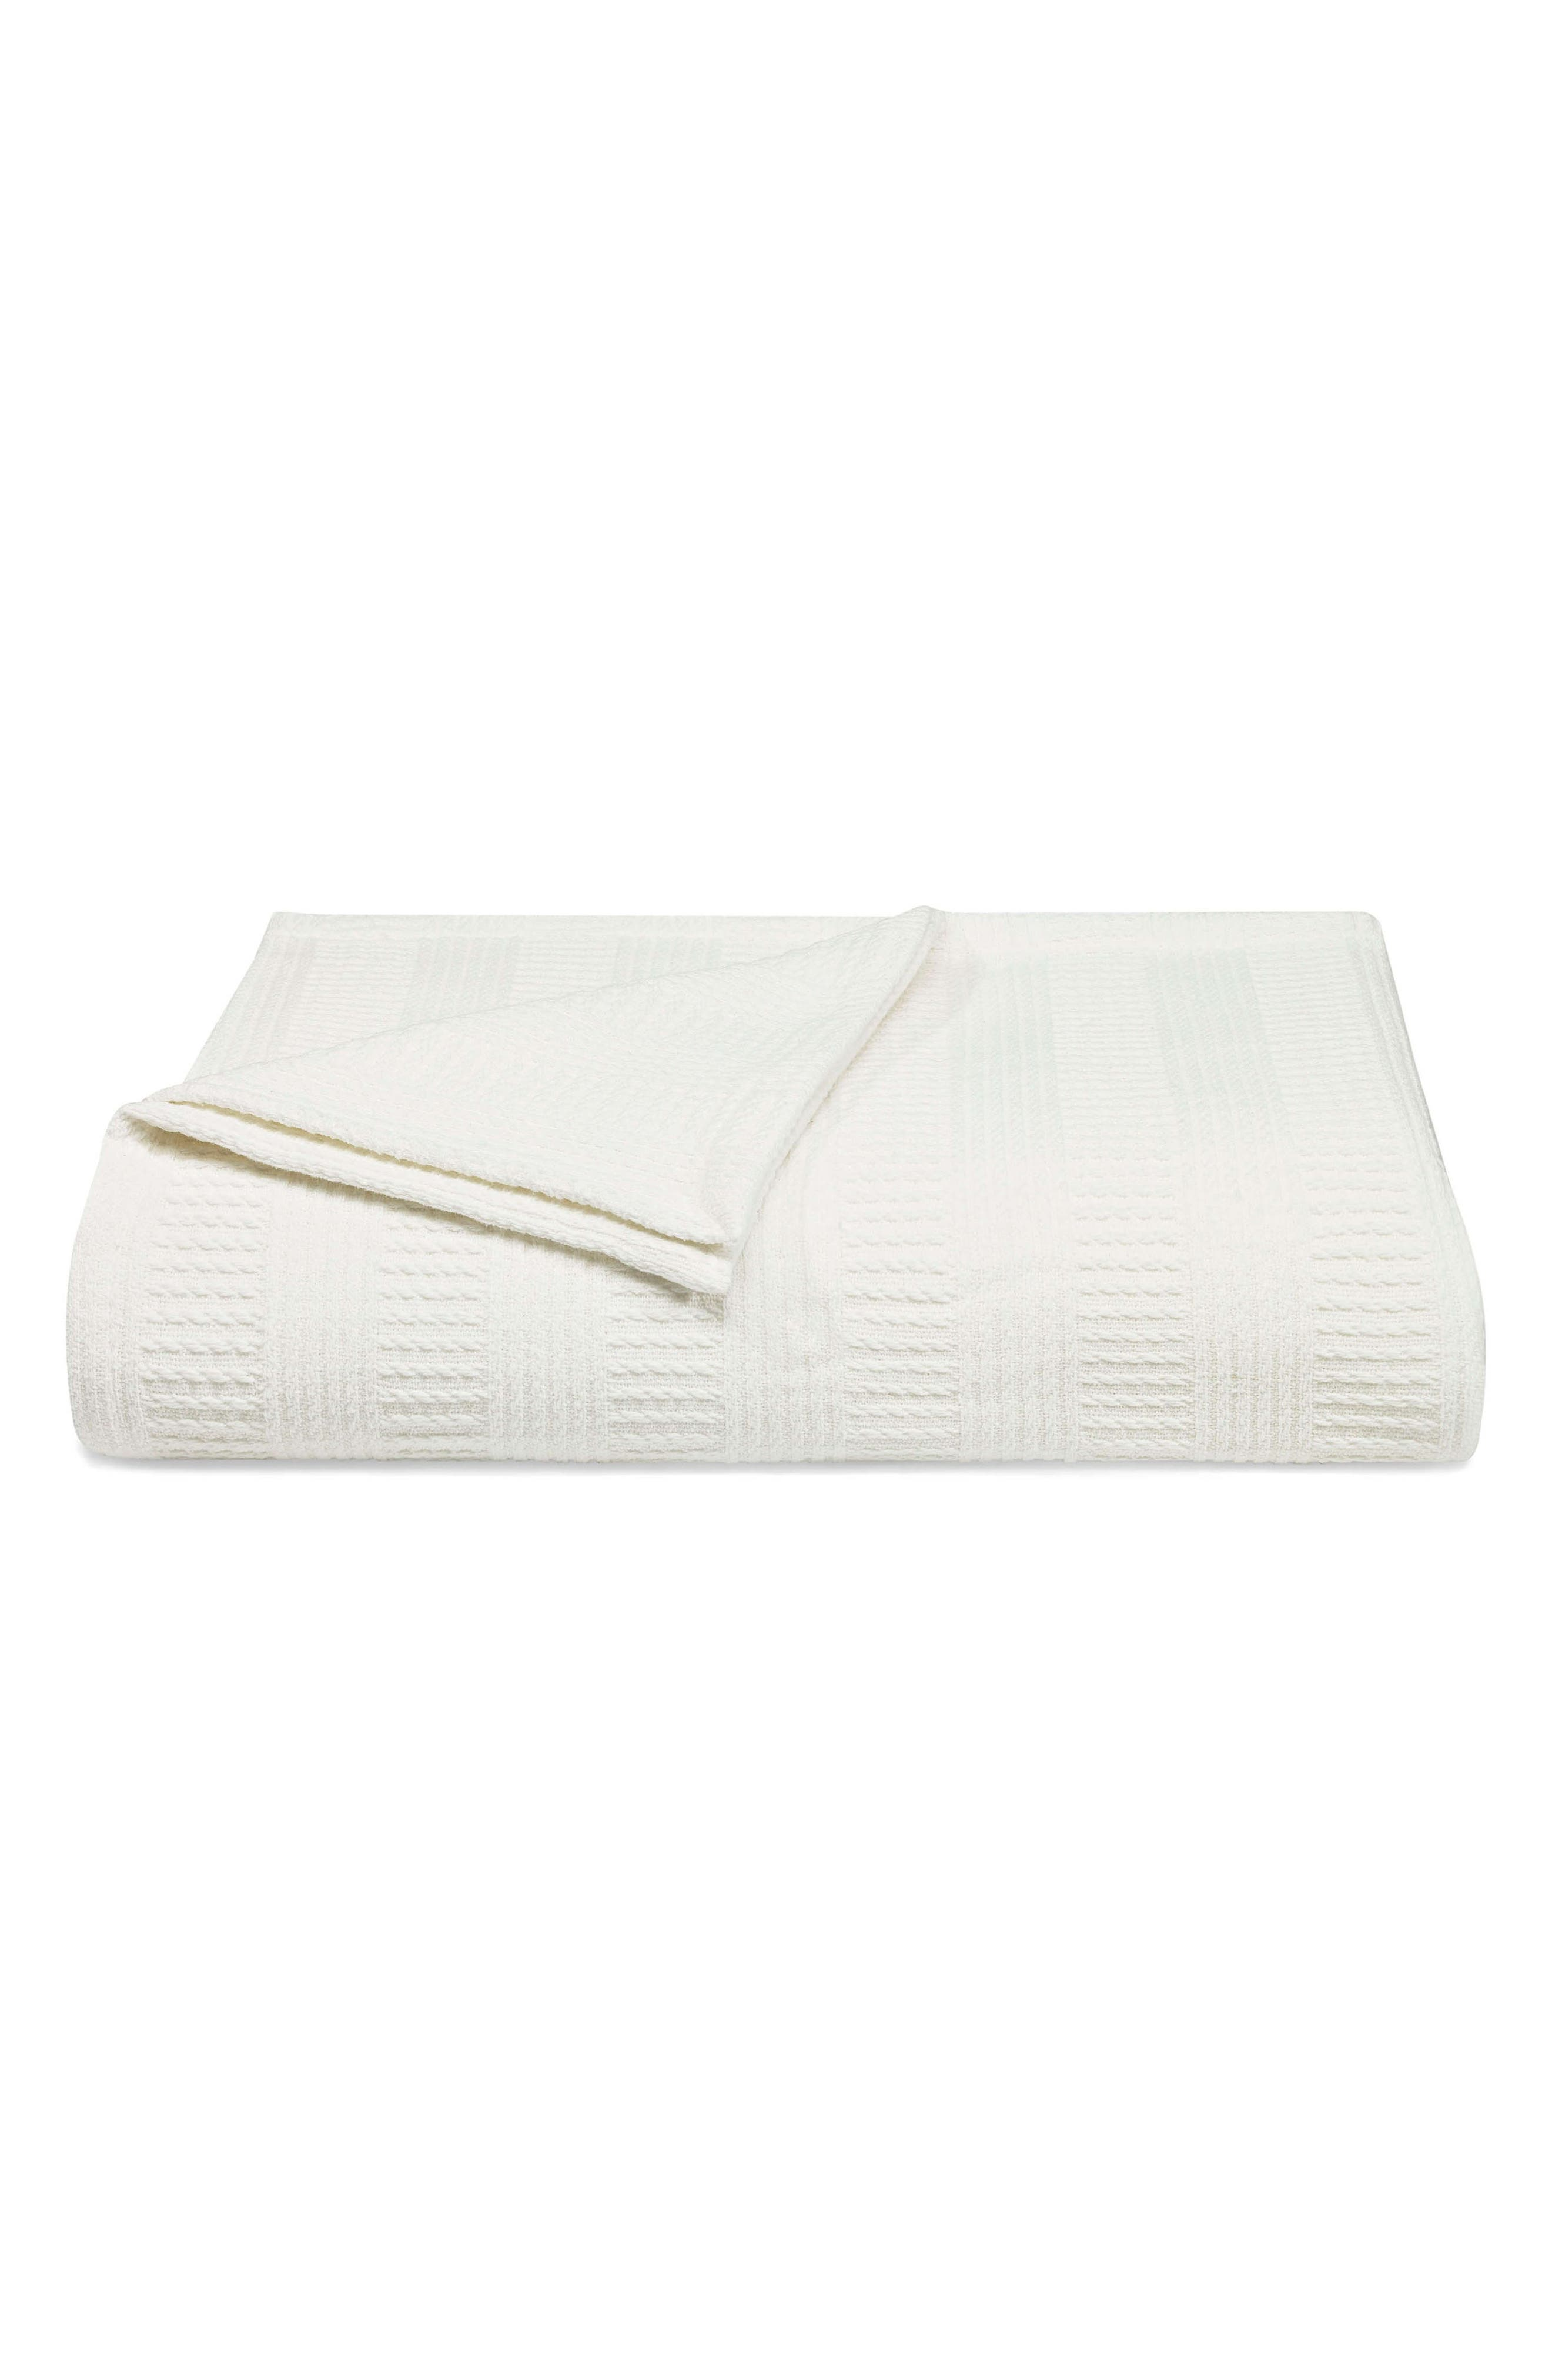 Rope Stripe Blanket,                             Main thumbnail 1, color,                             100